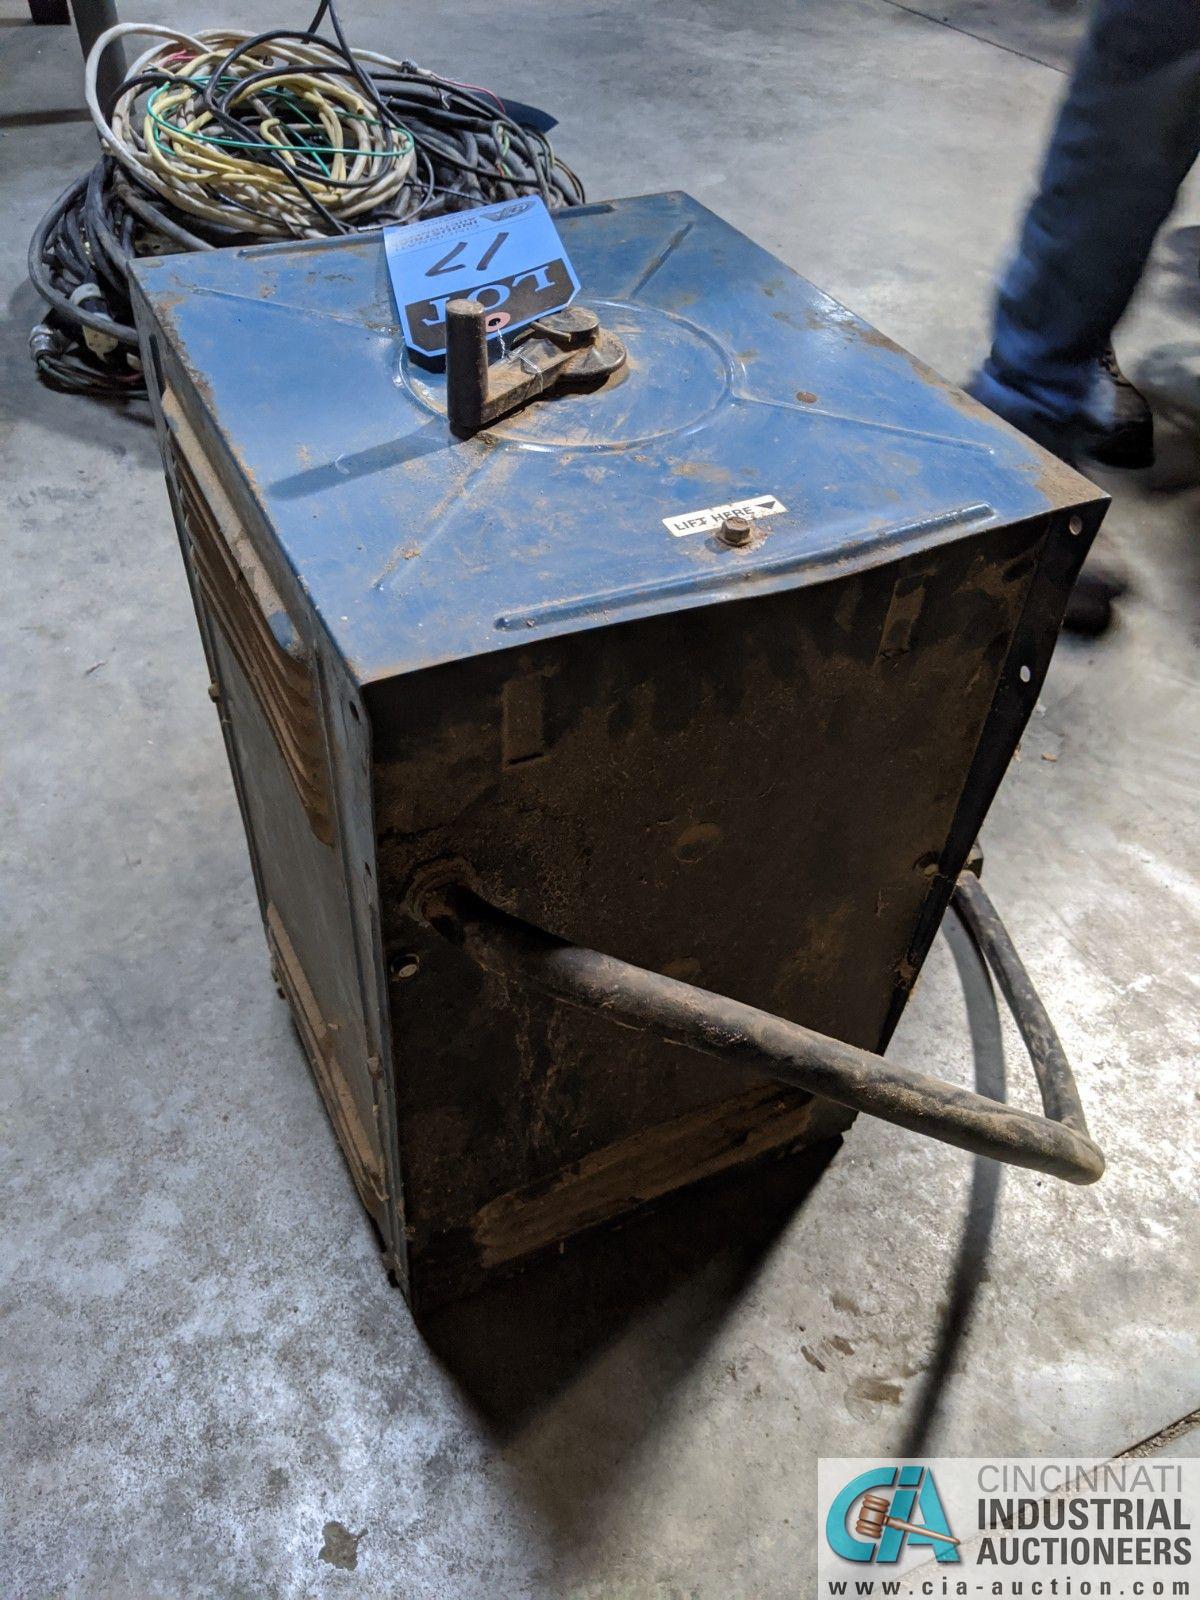 45 AMP MILLER THUNDERBOLT WELD POWER SOURCE (8635 East Ave., Mentor, OH 44060 - John Magnasum: 440- - Image 3 of 3